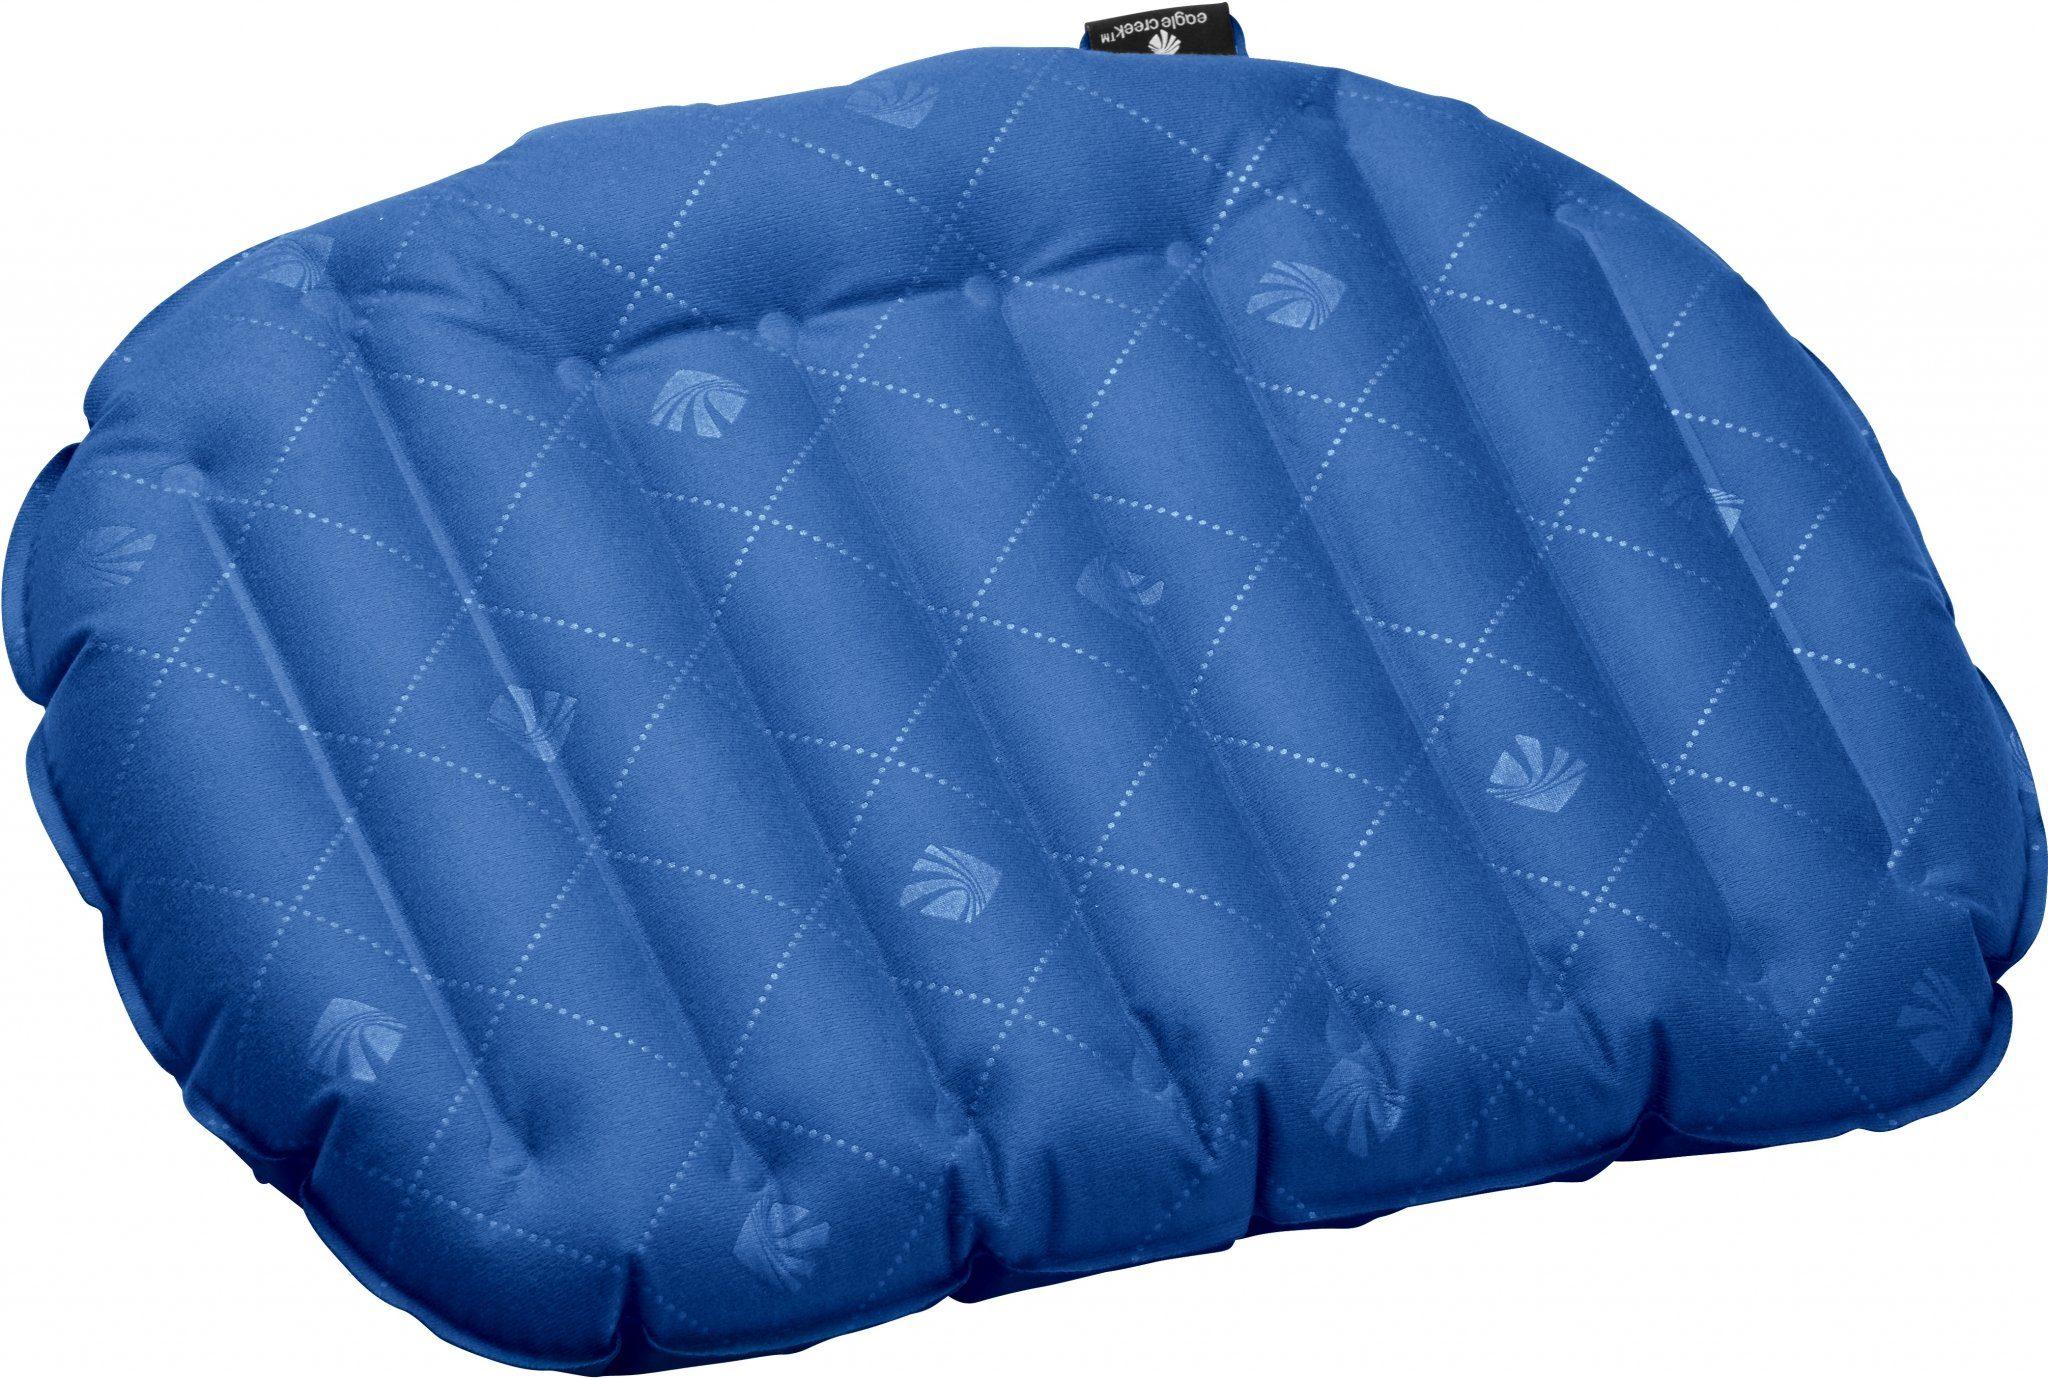 Eagle Creek Reisekissen »Fast Inflate Travel Seat Cushion«